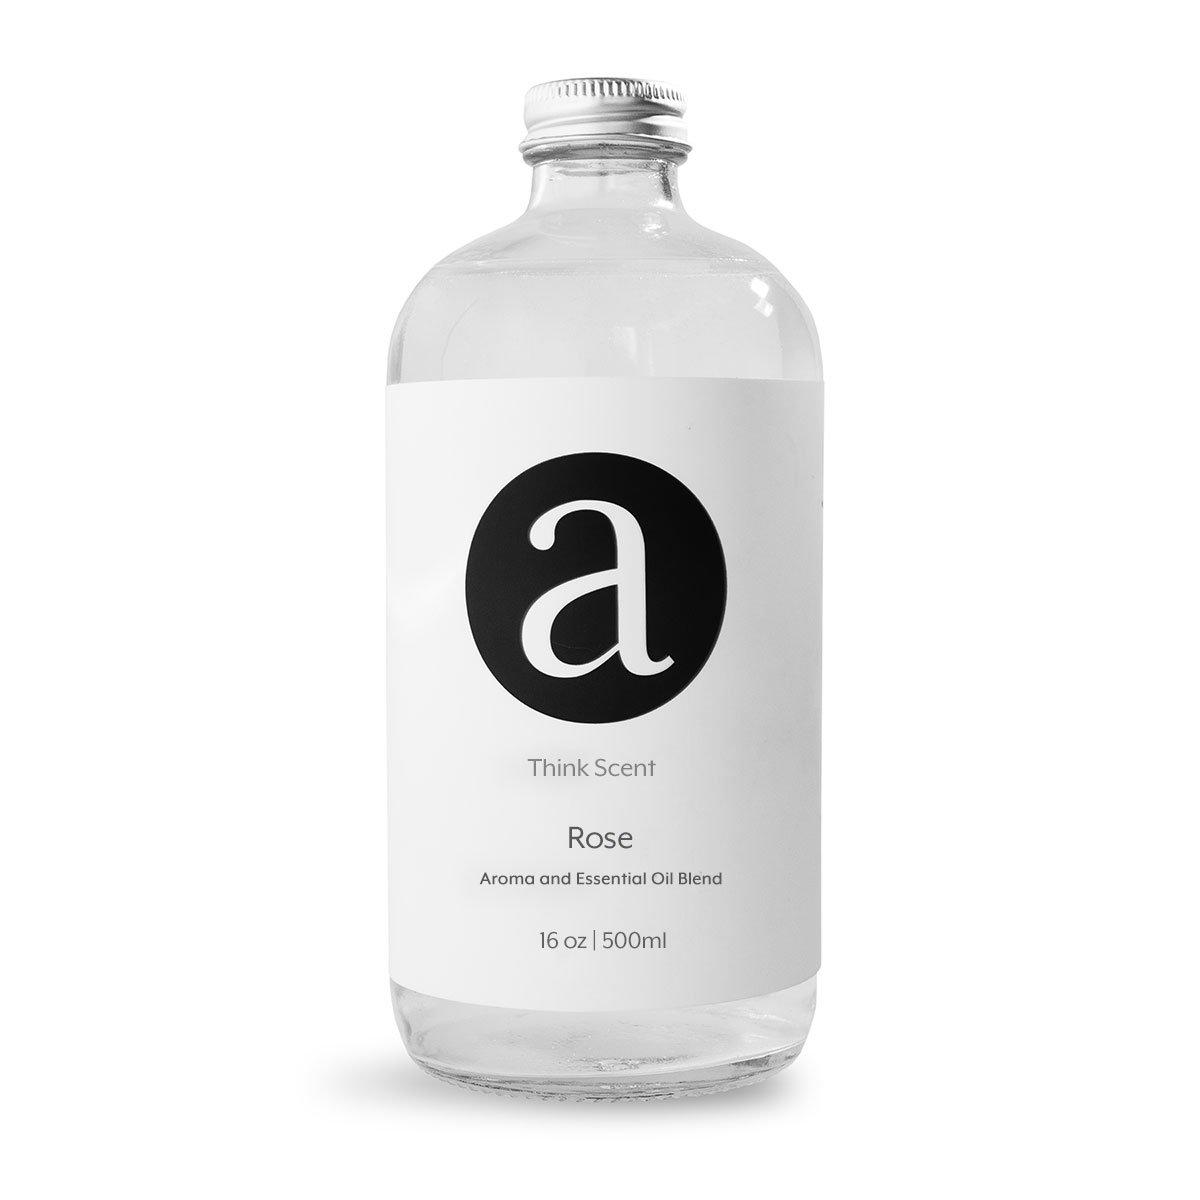 (Rose) Aroma / Fragrance Oil For AromaTech Air Freshener Scent Diffuser (500ml)